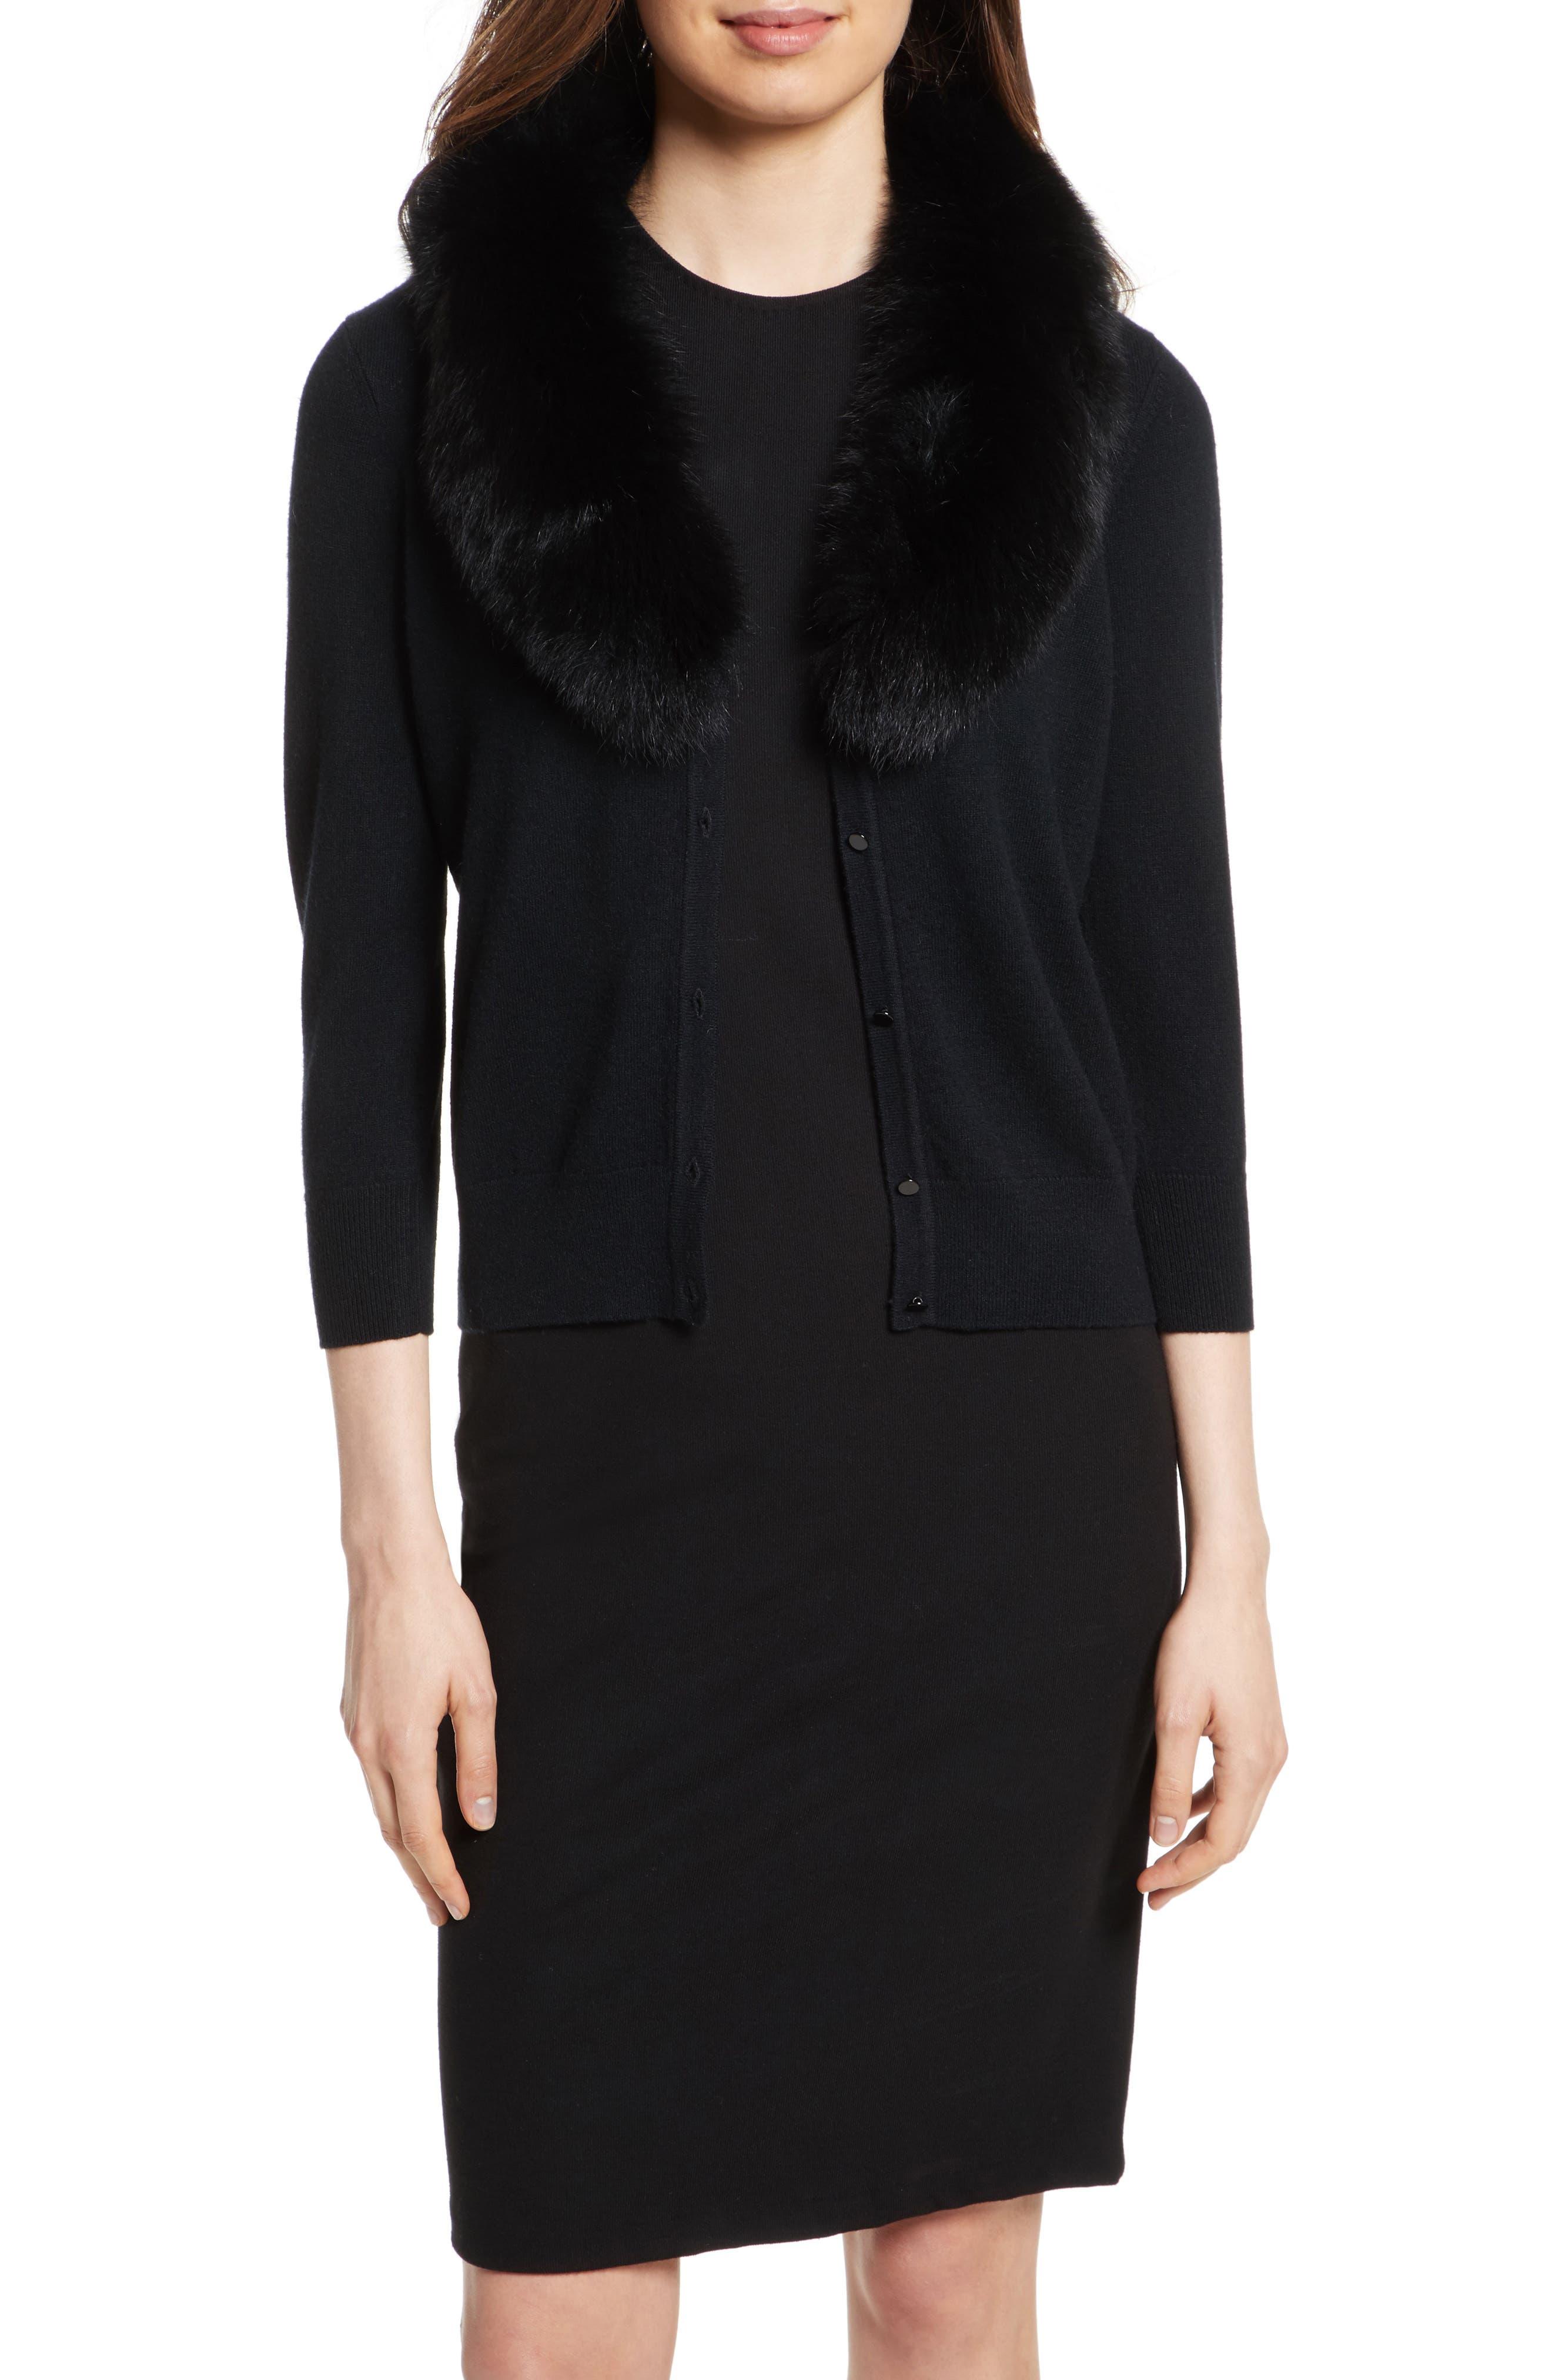 Milly Genuine Fox Fur Collar Cardigan